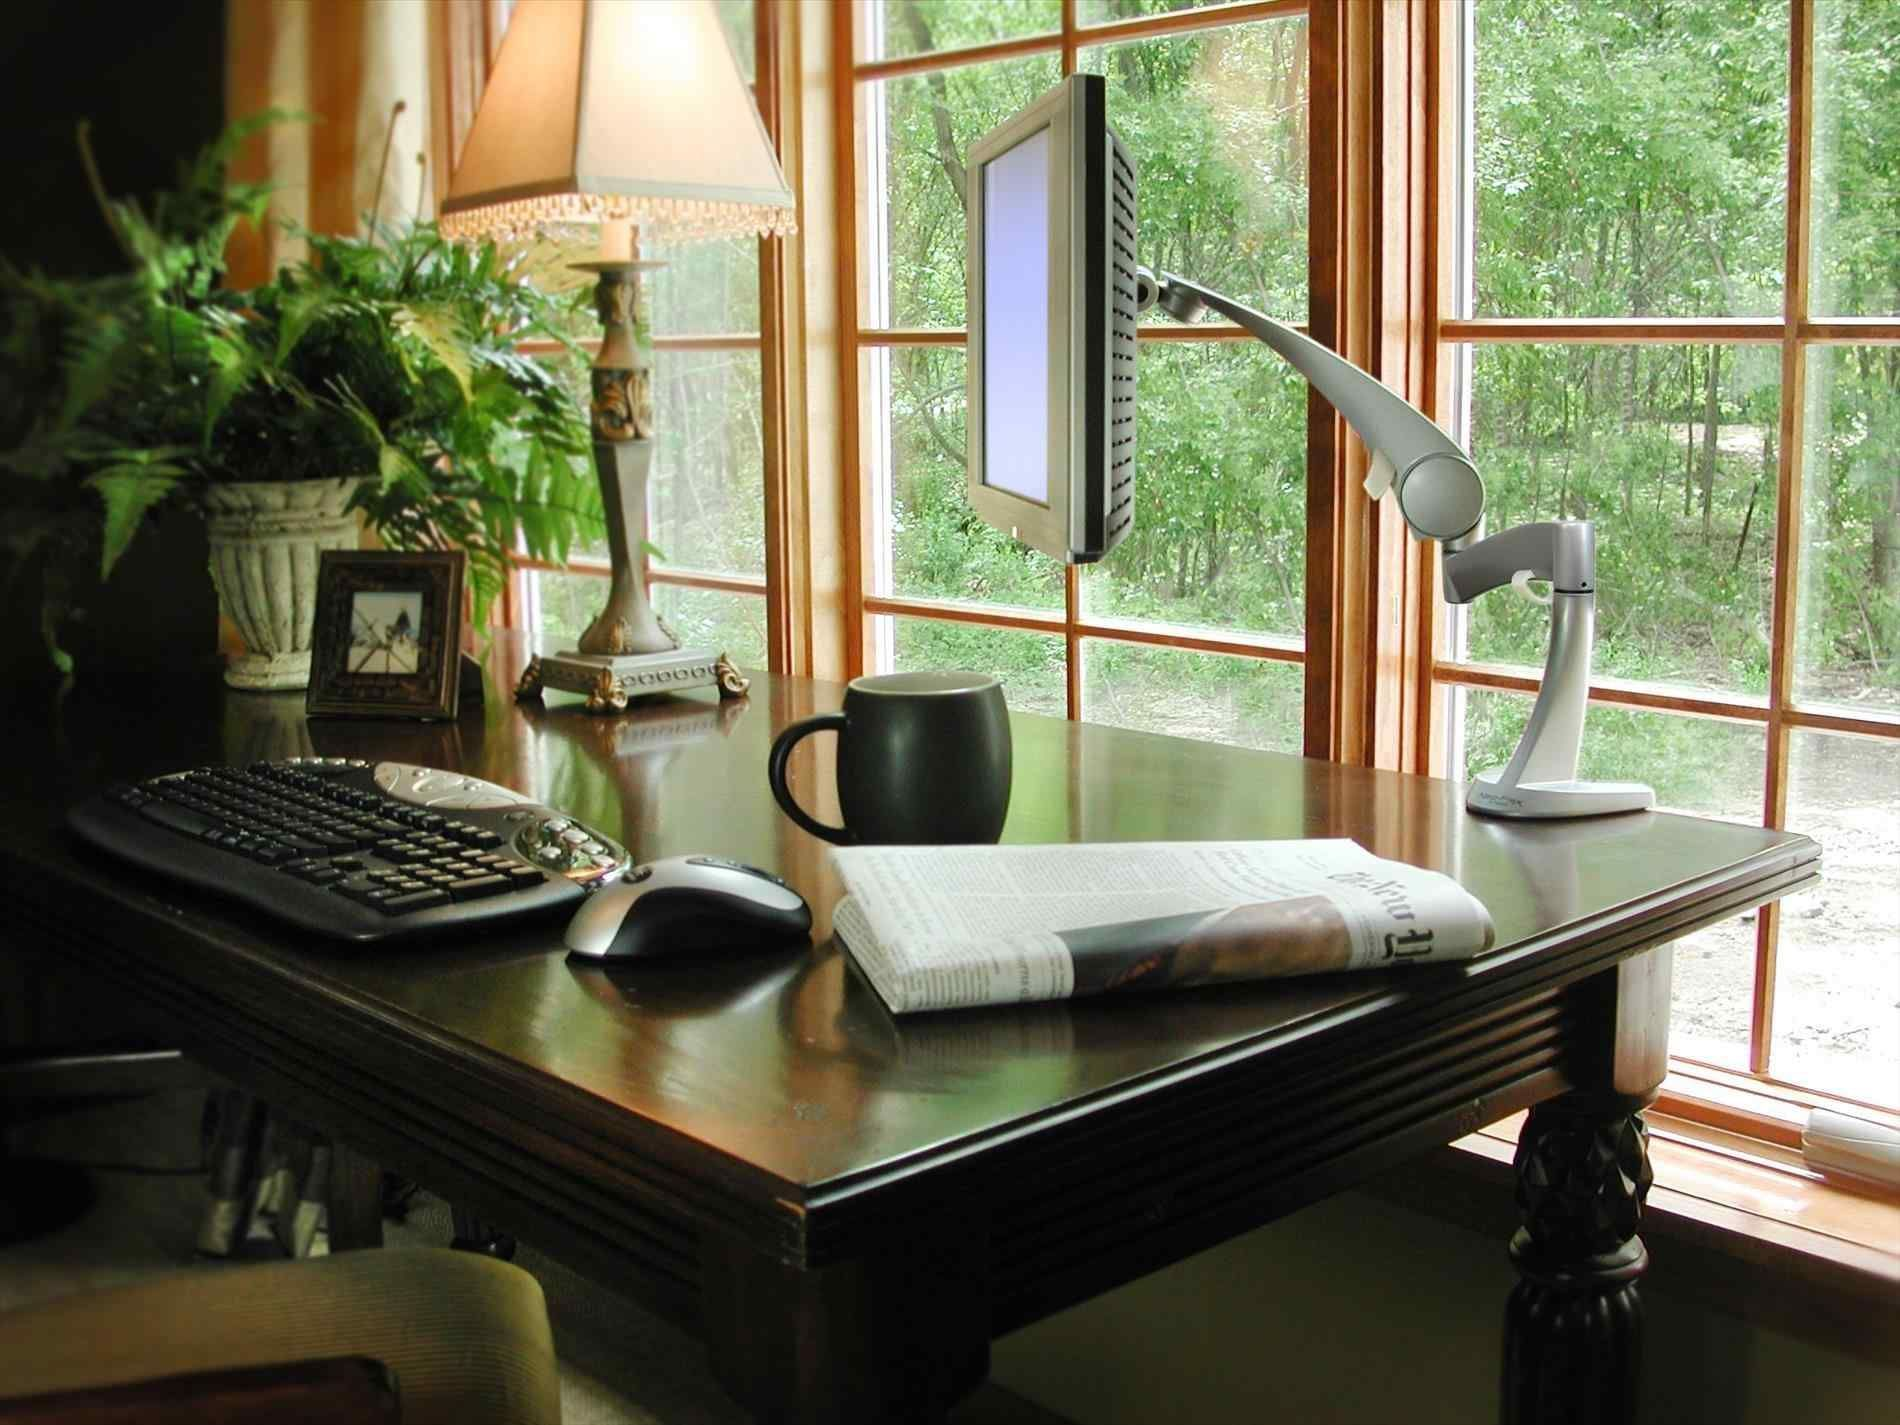 zen office design. Cool Gorgeous 10+ Zen Office Design Ideas For Cozy Room Https://breakpr E